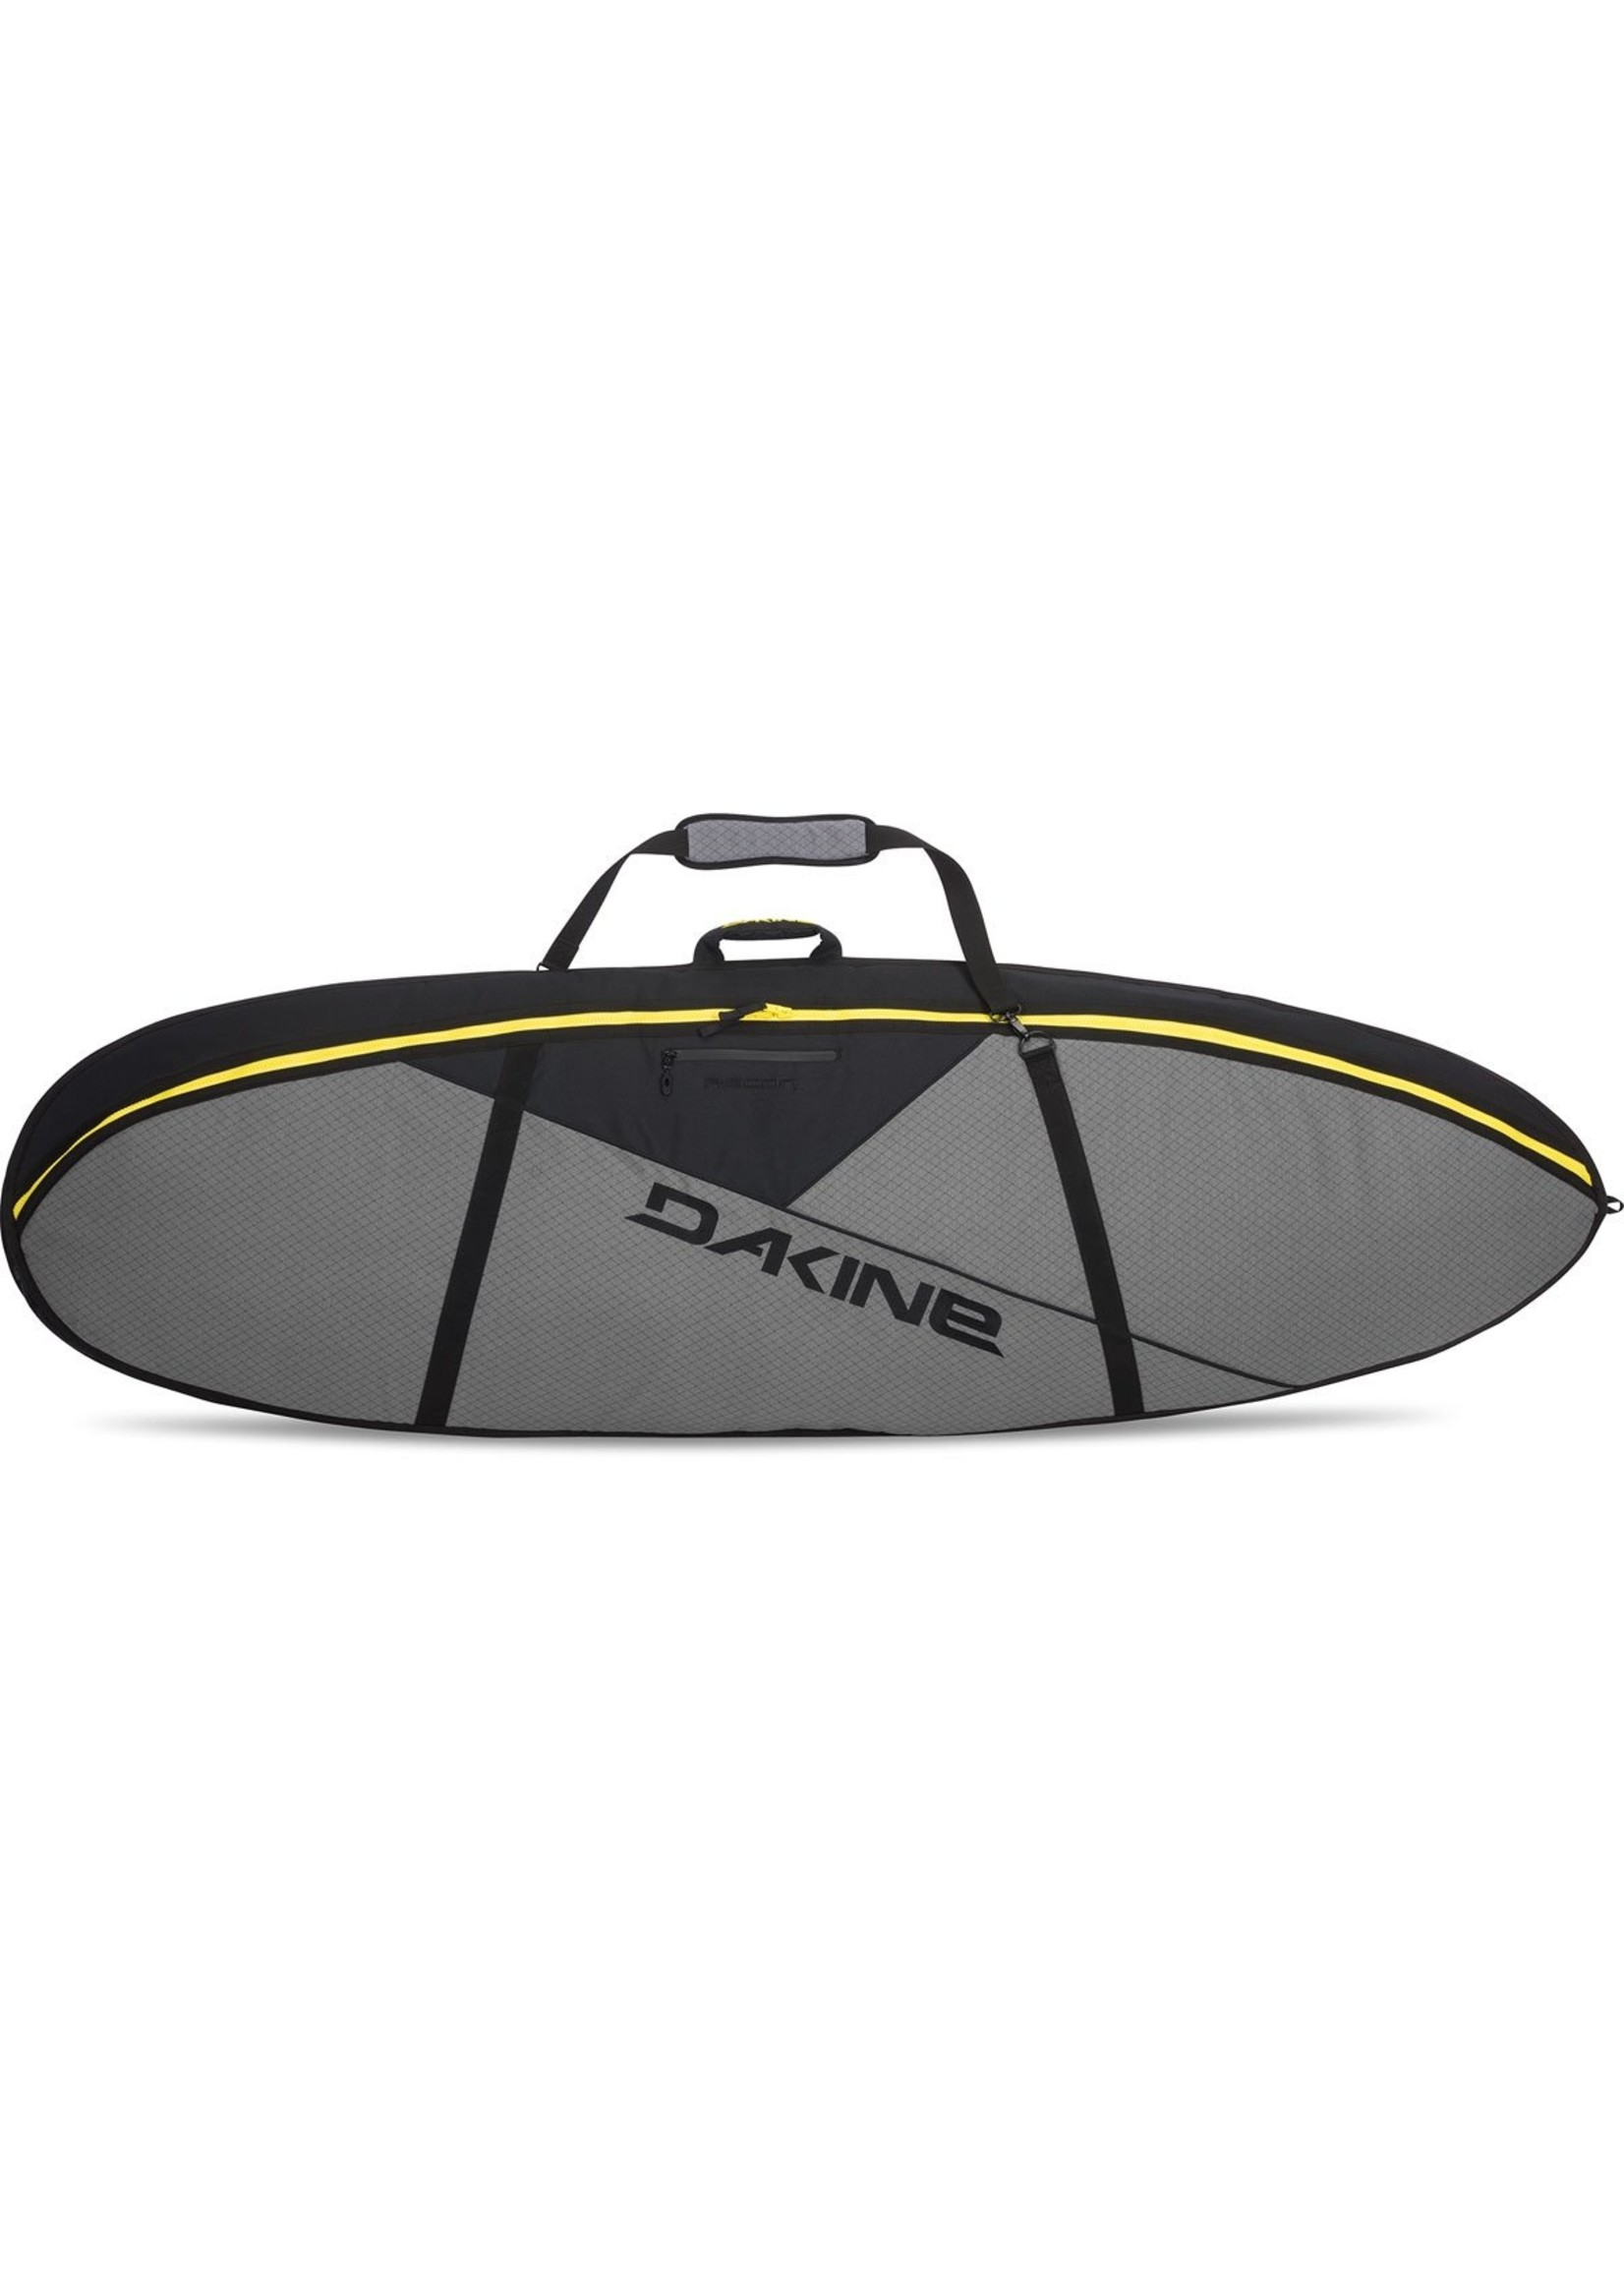 Dakine RECON DOUBLE SURFBOARD BAG - THRUSTER 6'6''